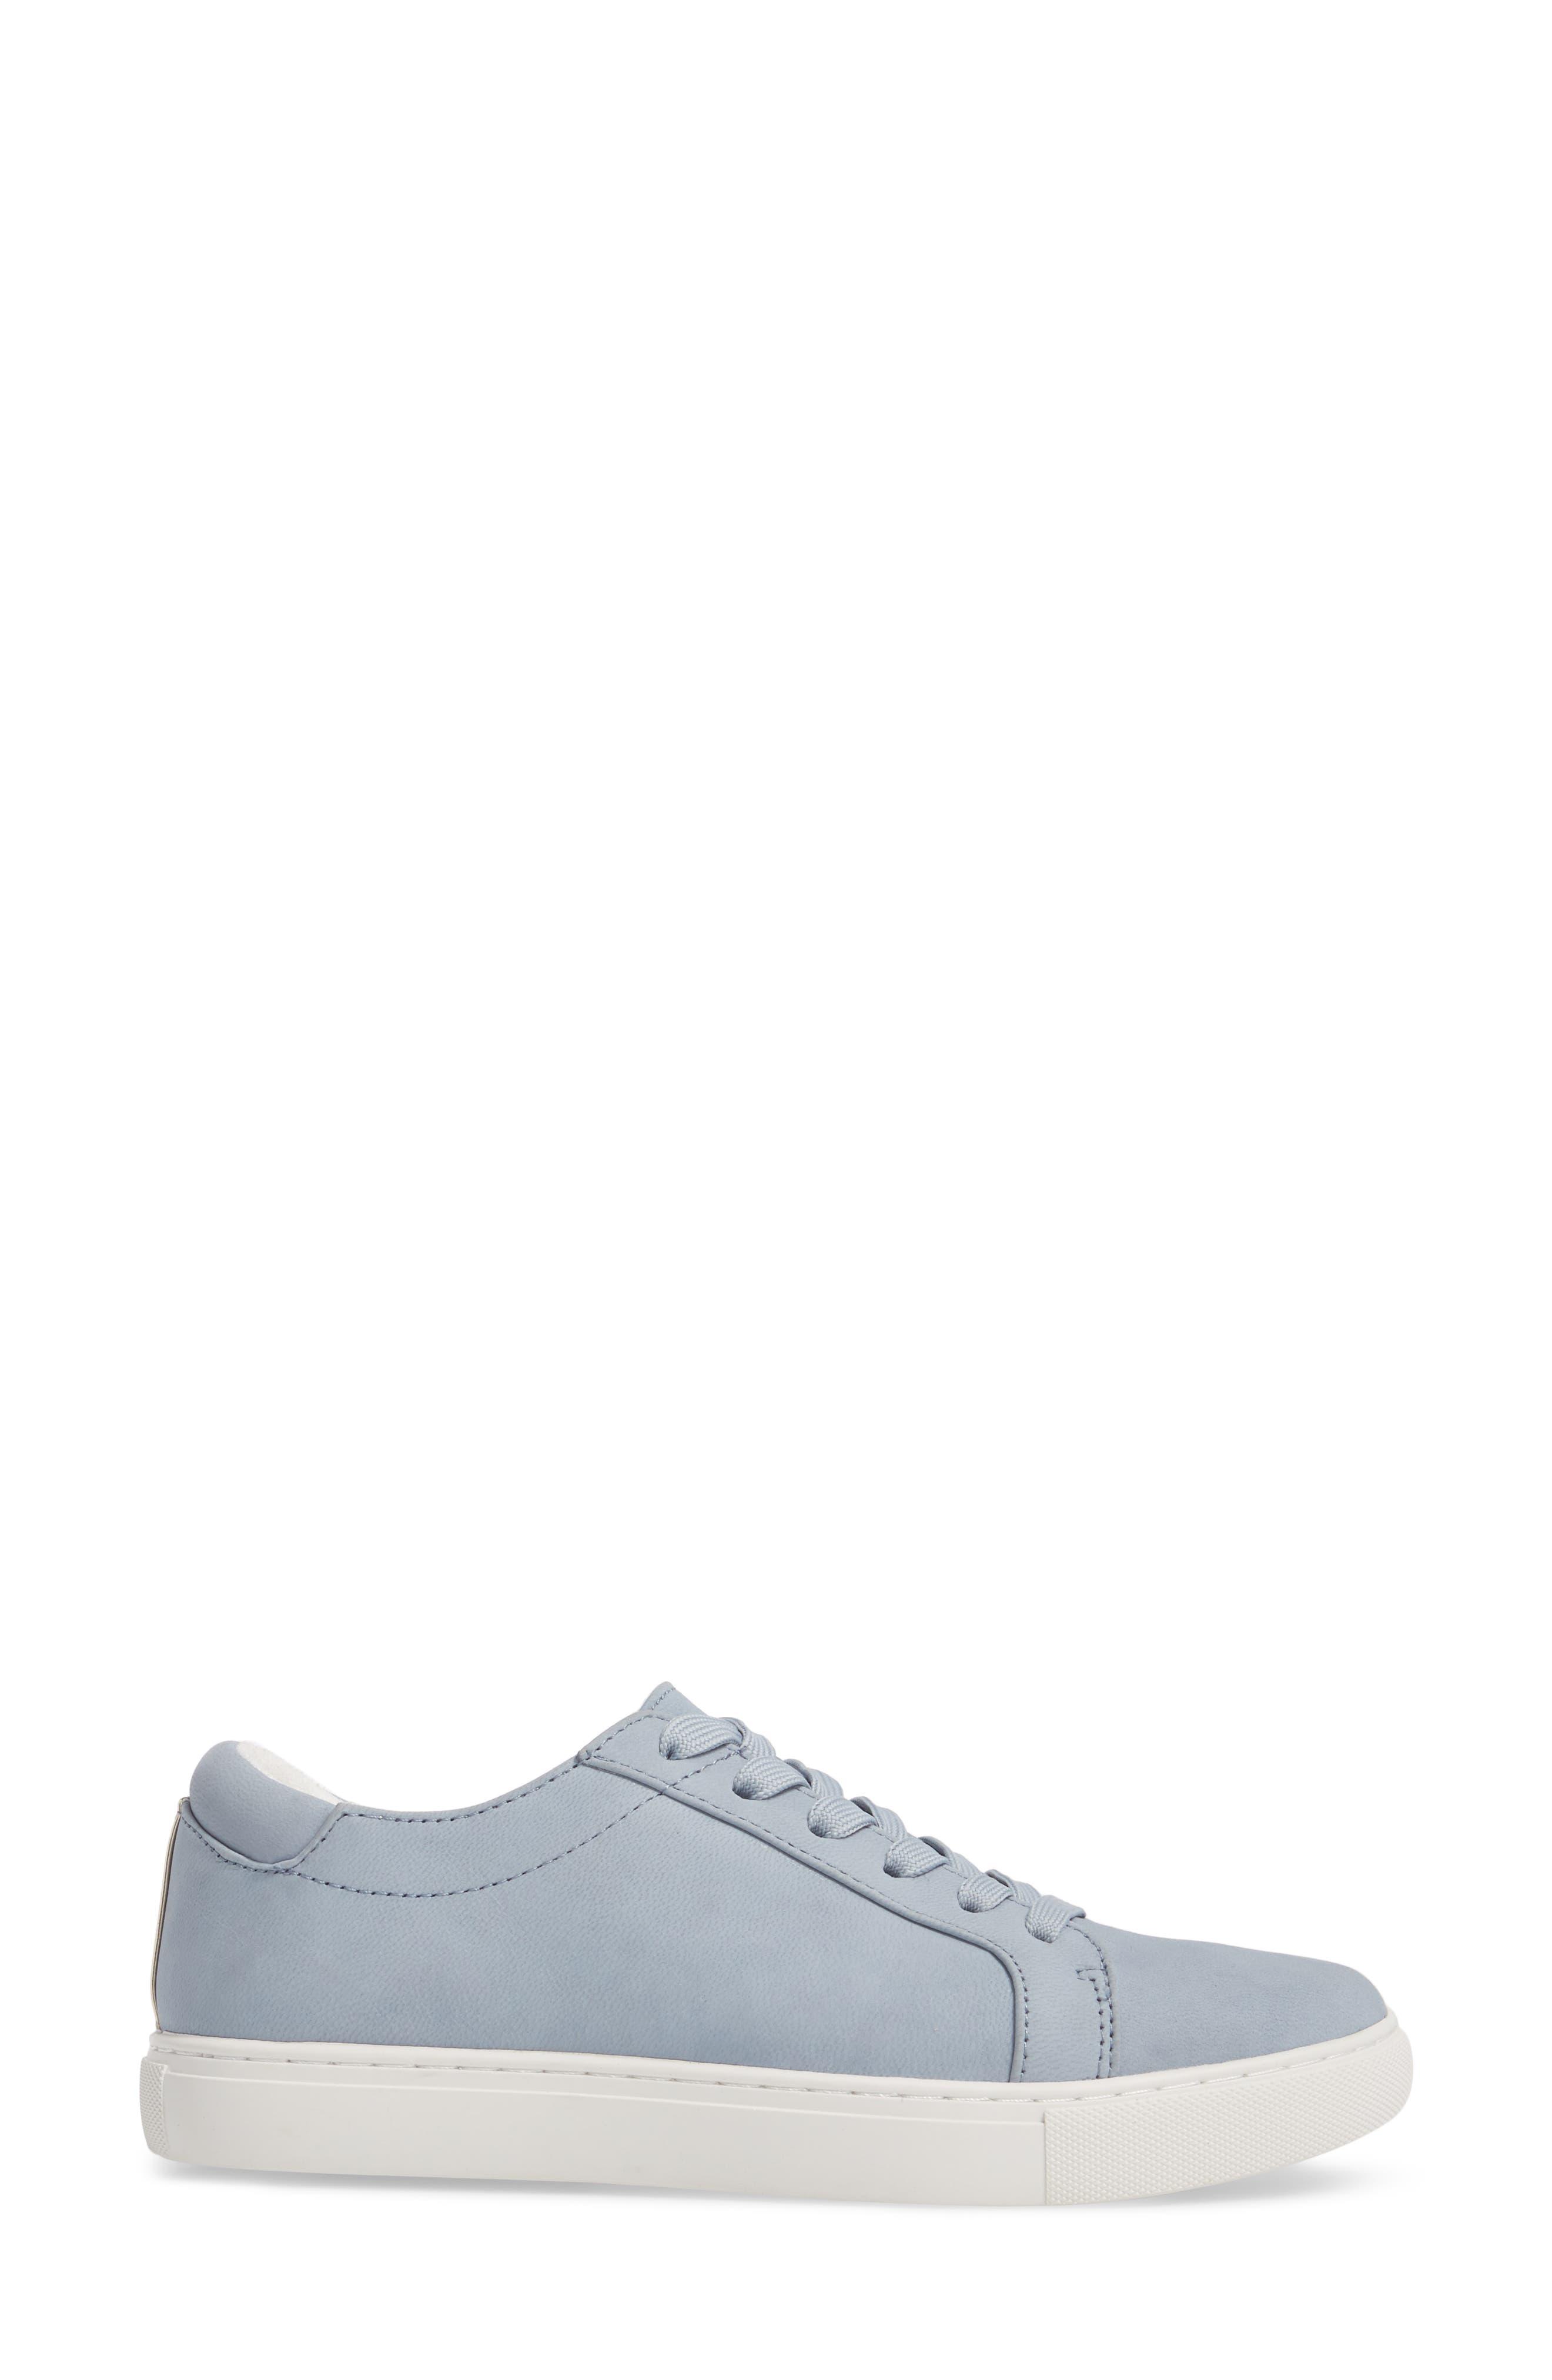 Kam Techni-Cole Sneaker,                             Alternate thumbnail 3, color,                             025